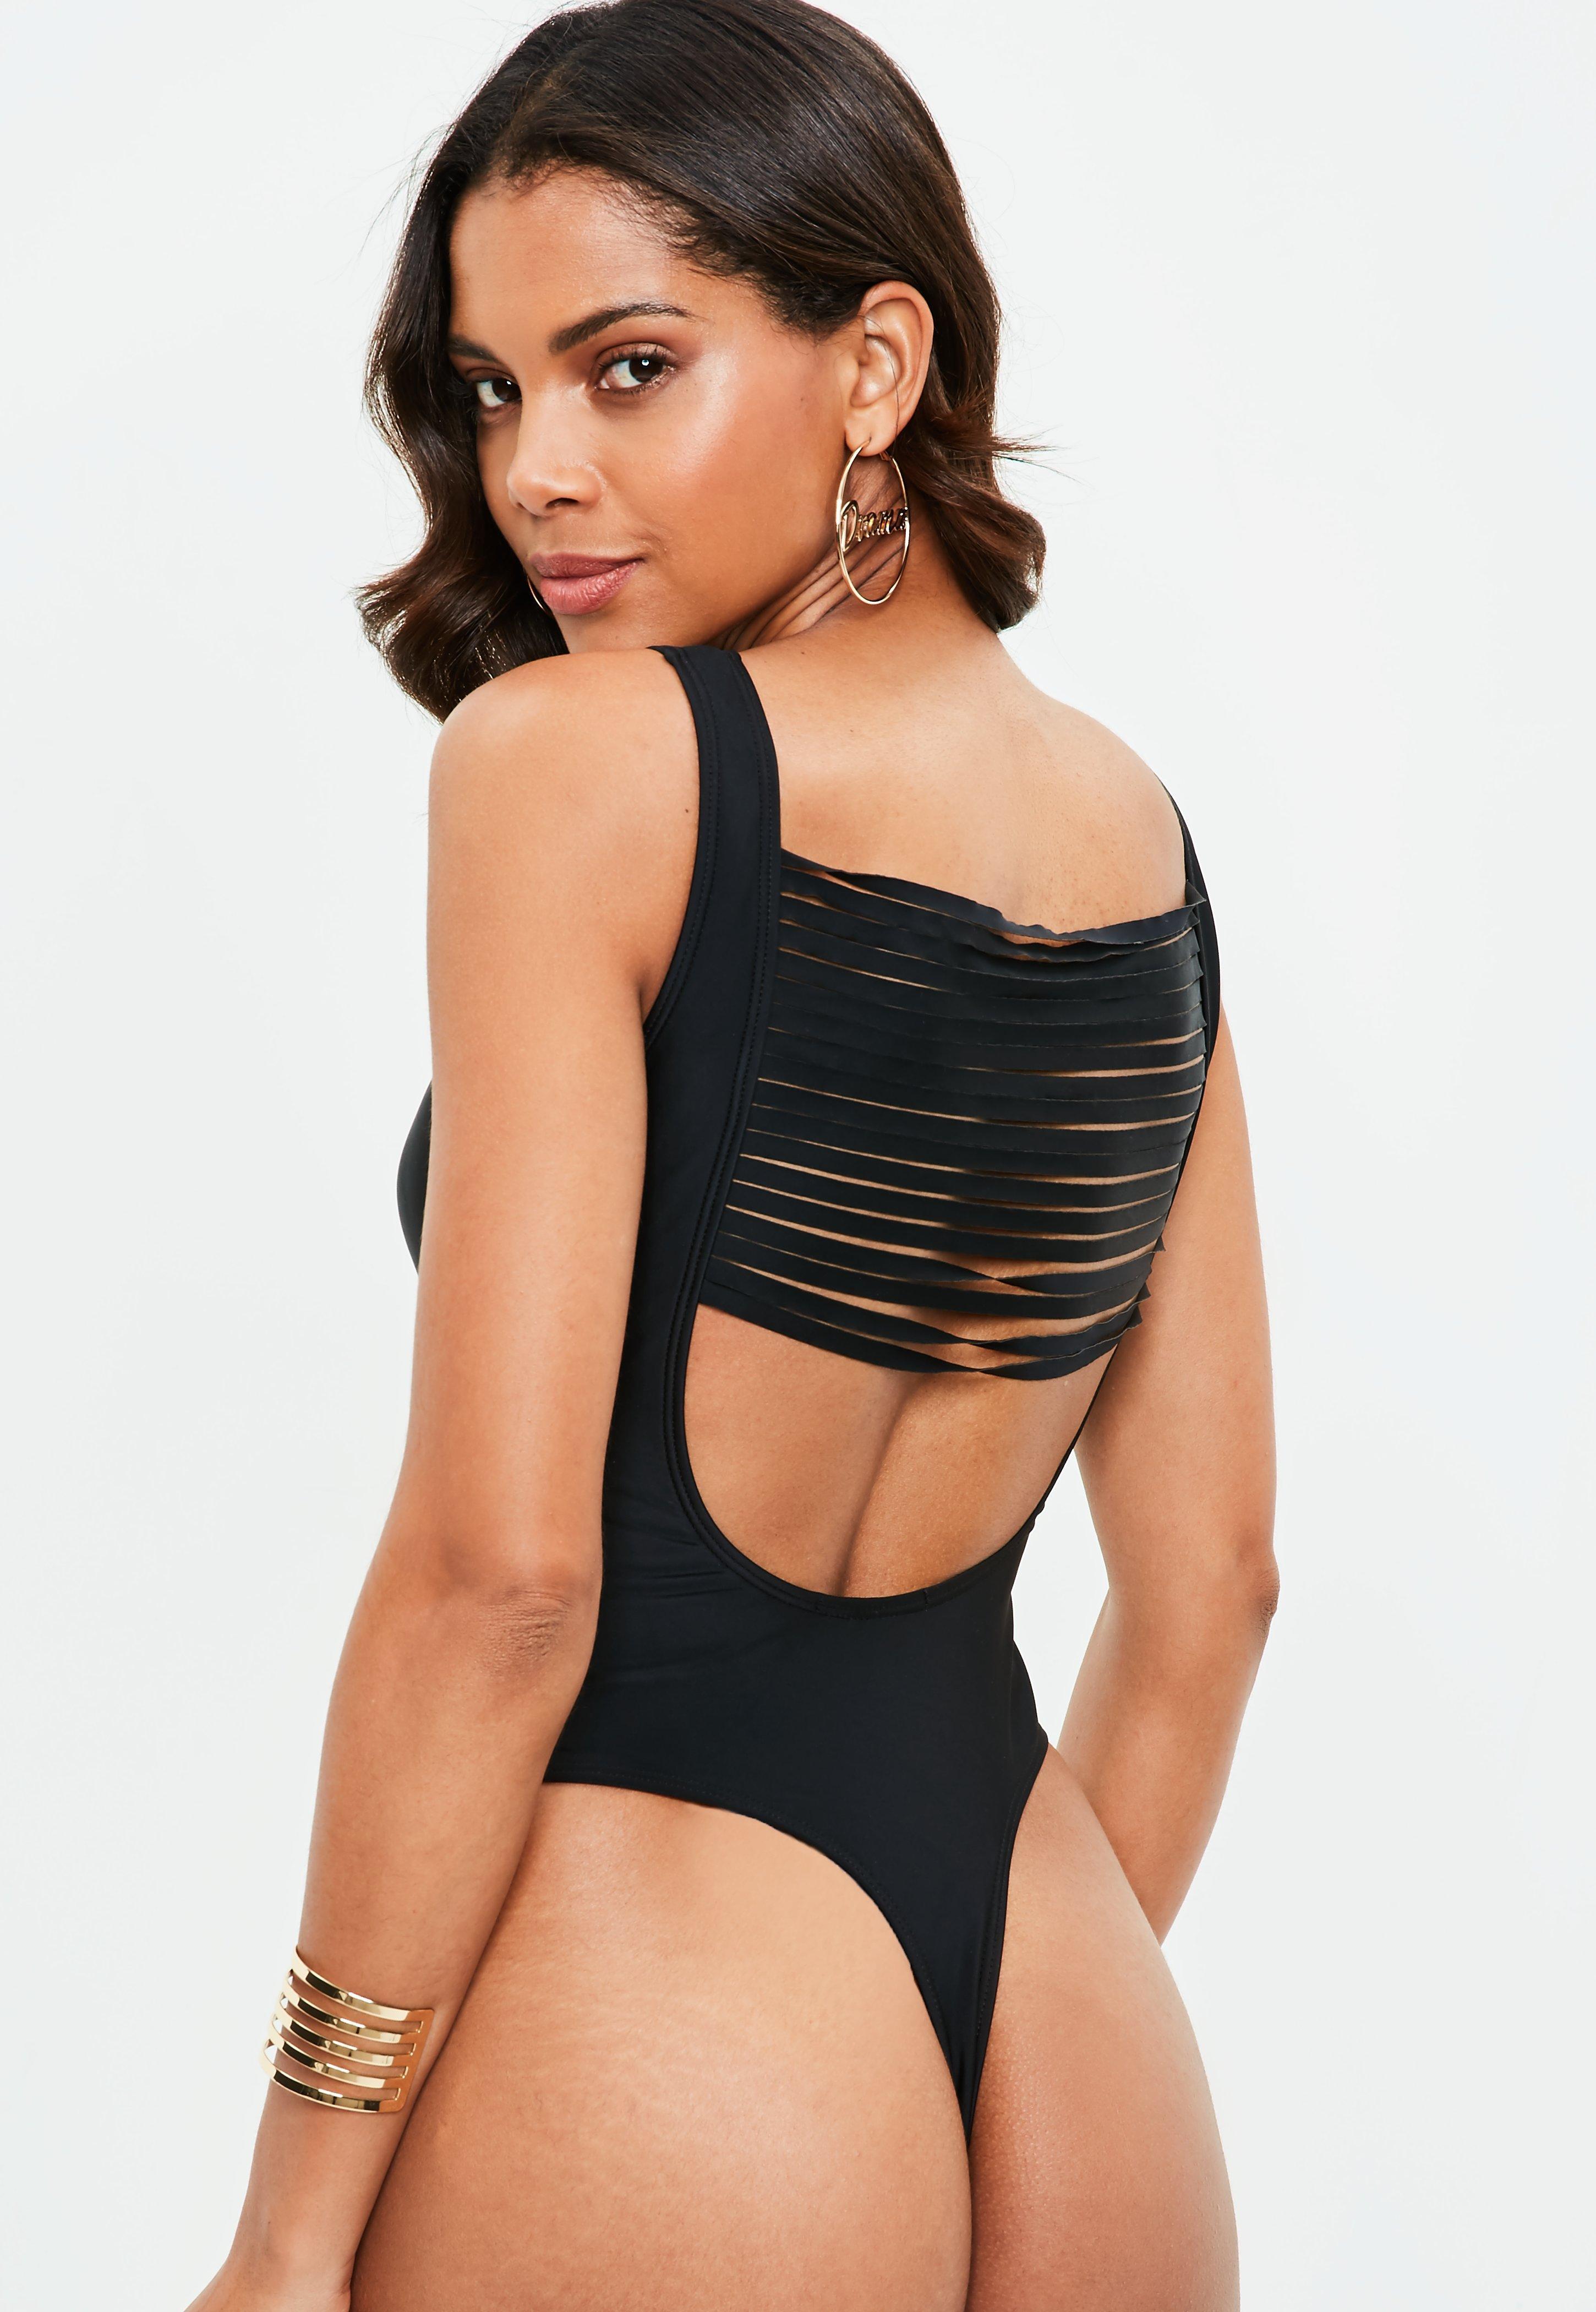 821b604b02ed7 Lyst - Missguided Black Shred Back Thong Swimsuit in Black